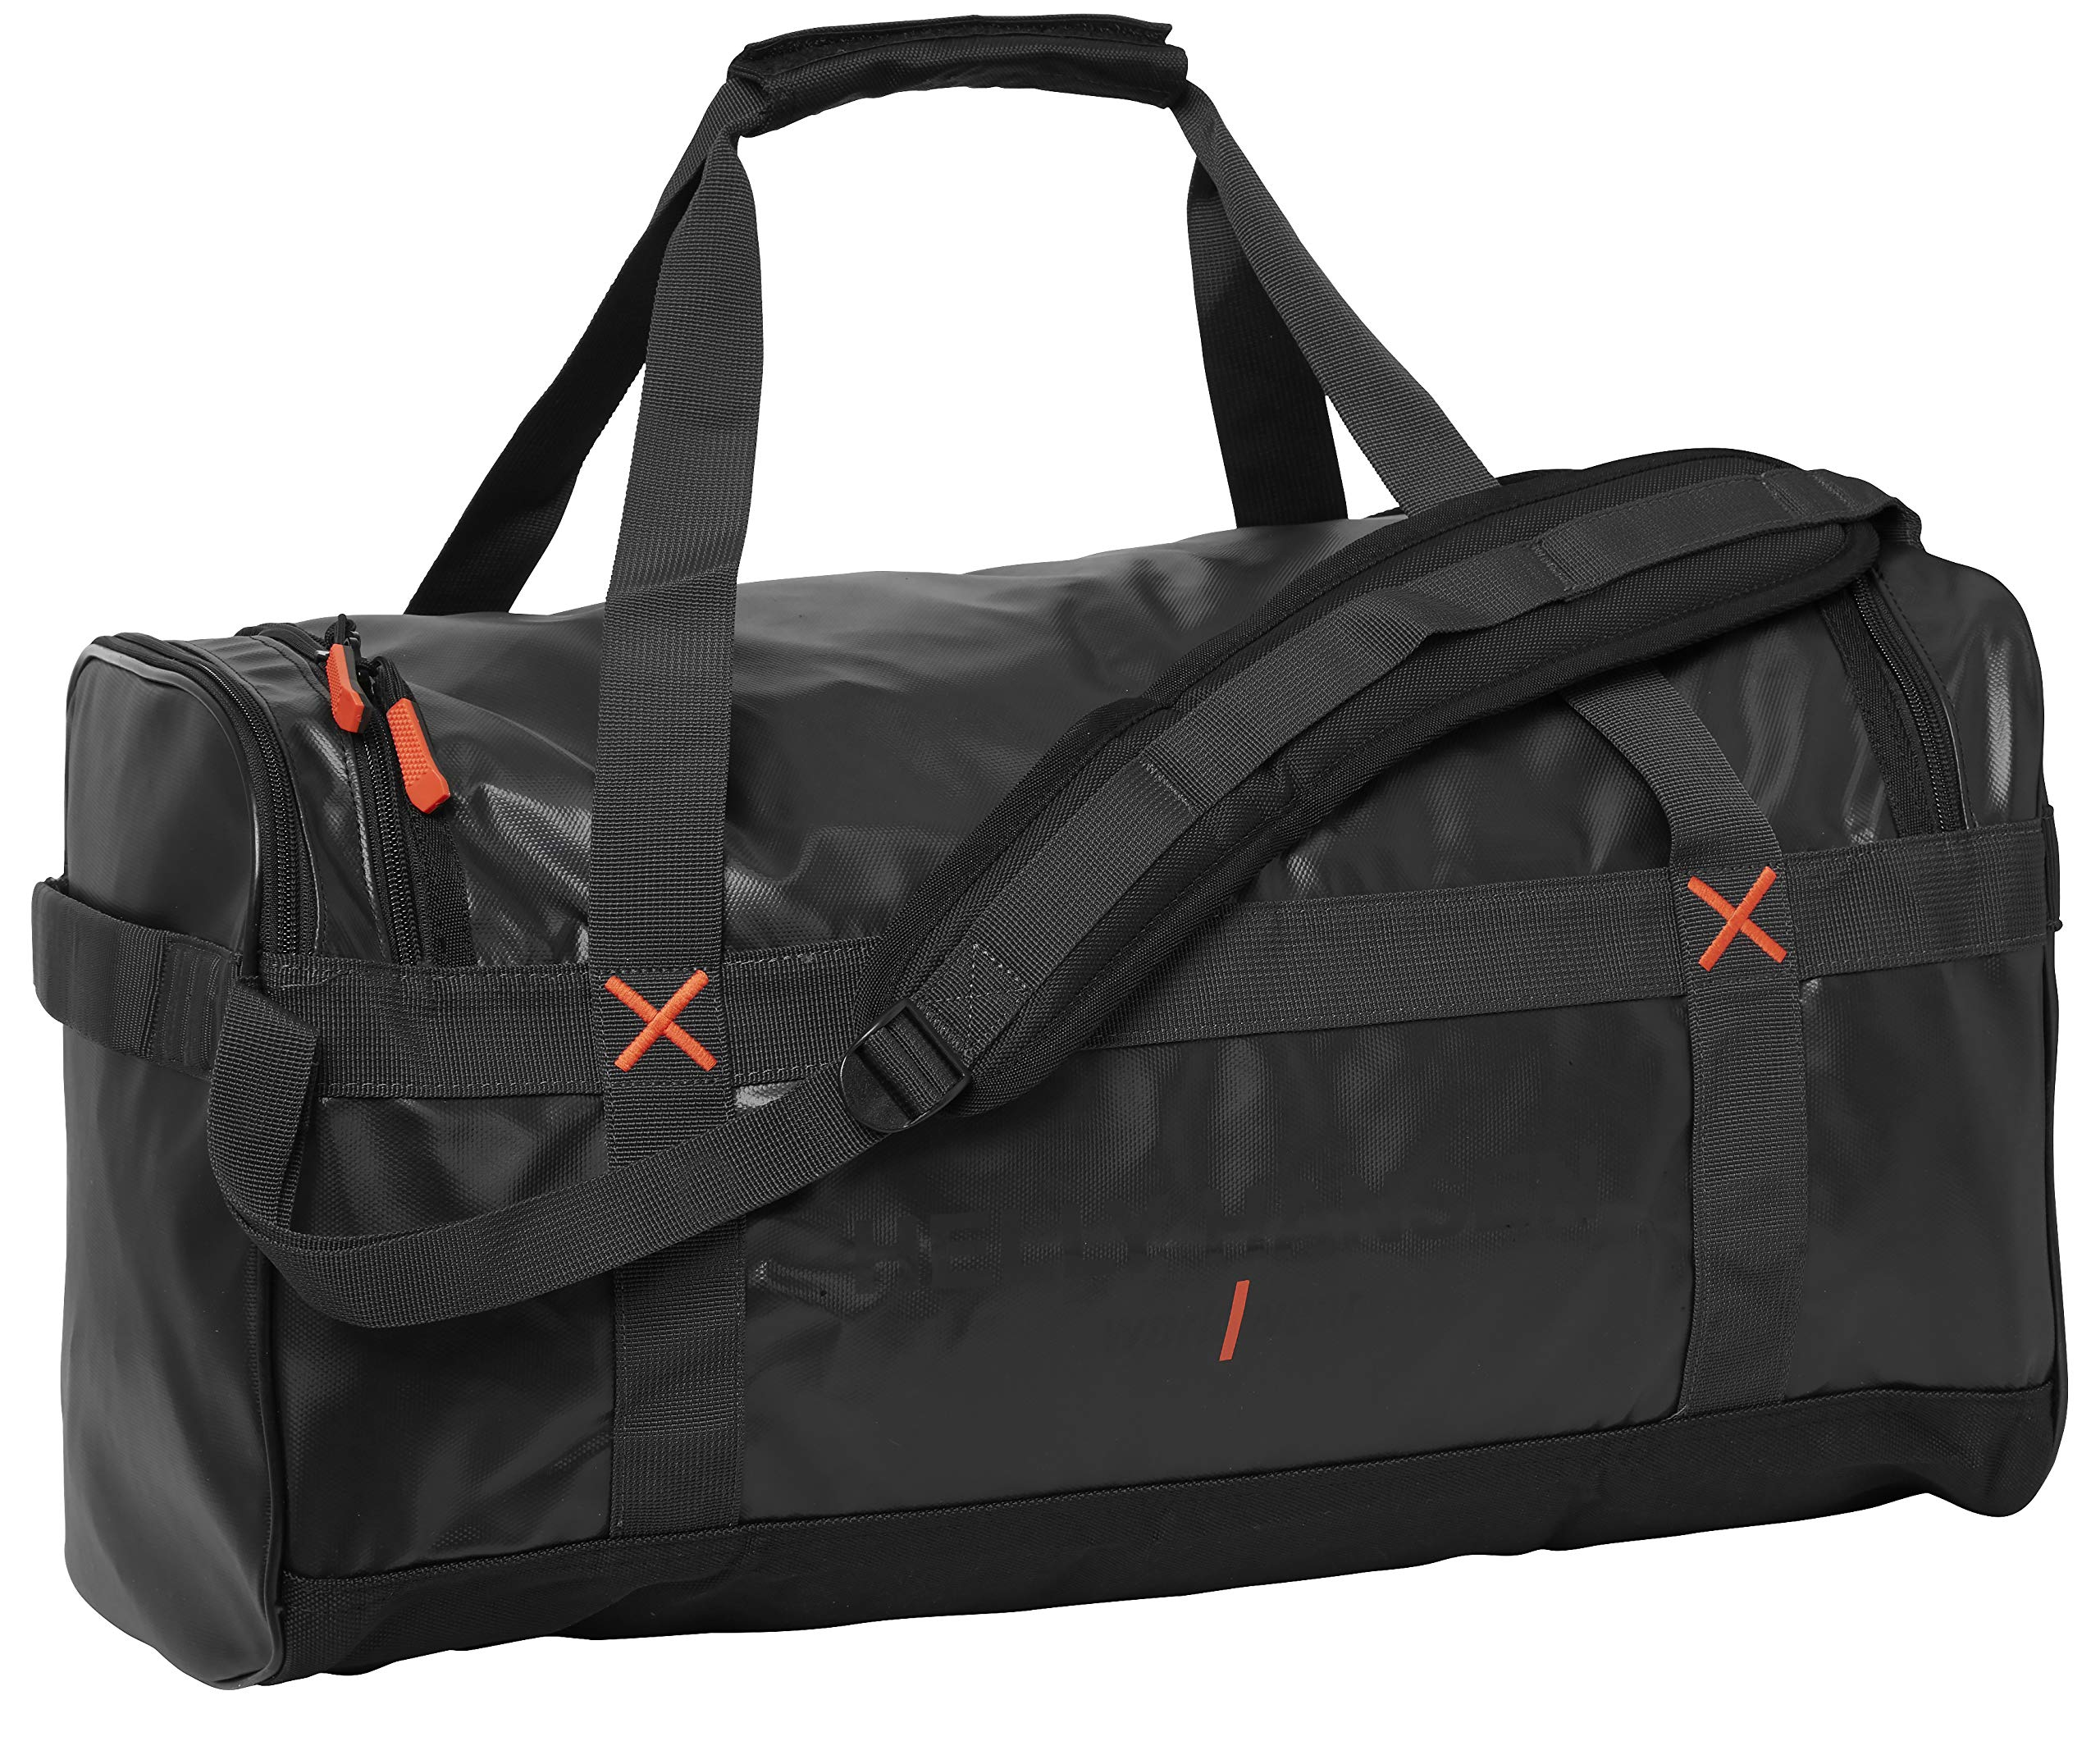 Helly Hansen 79575 Unisex Duffel Bag 120L, Black - Standard